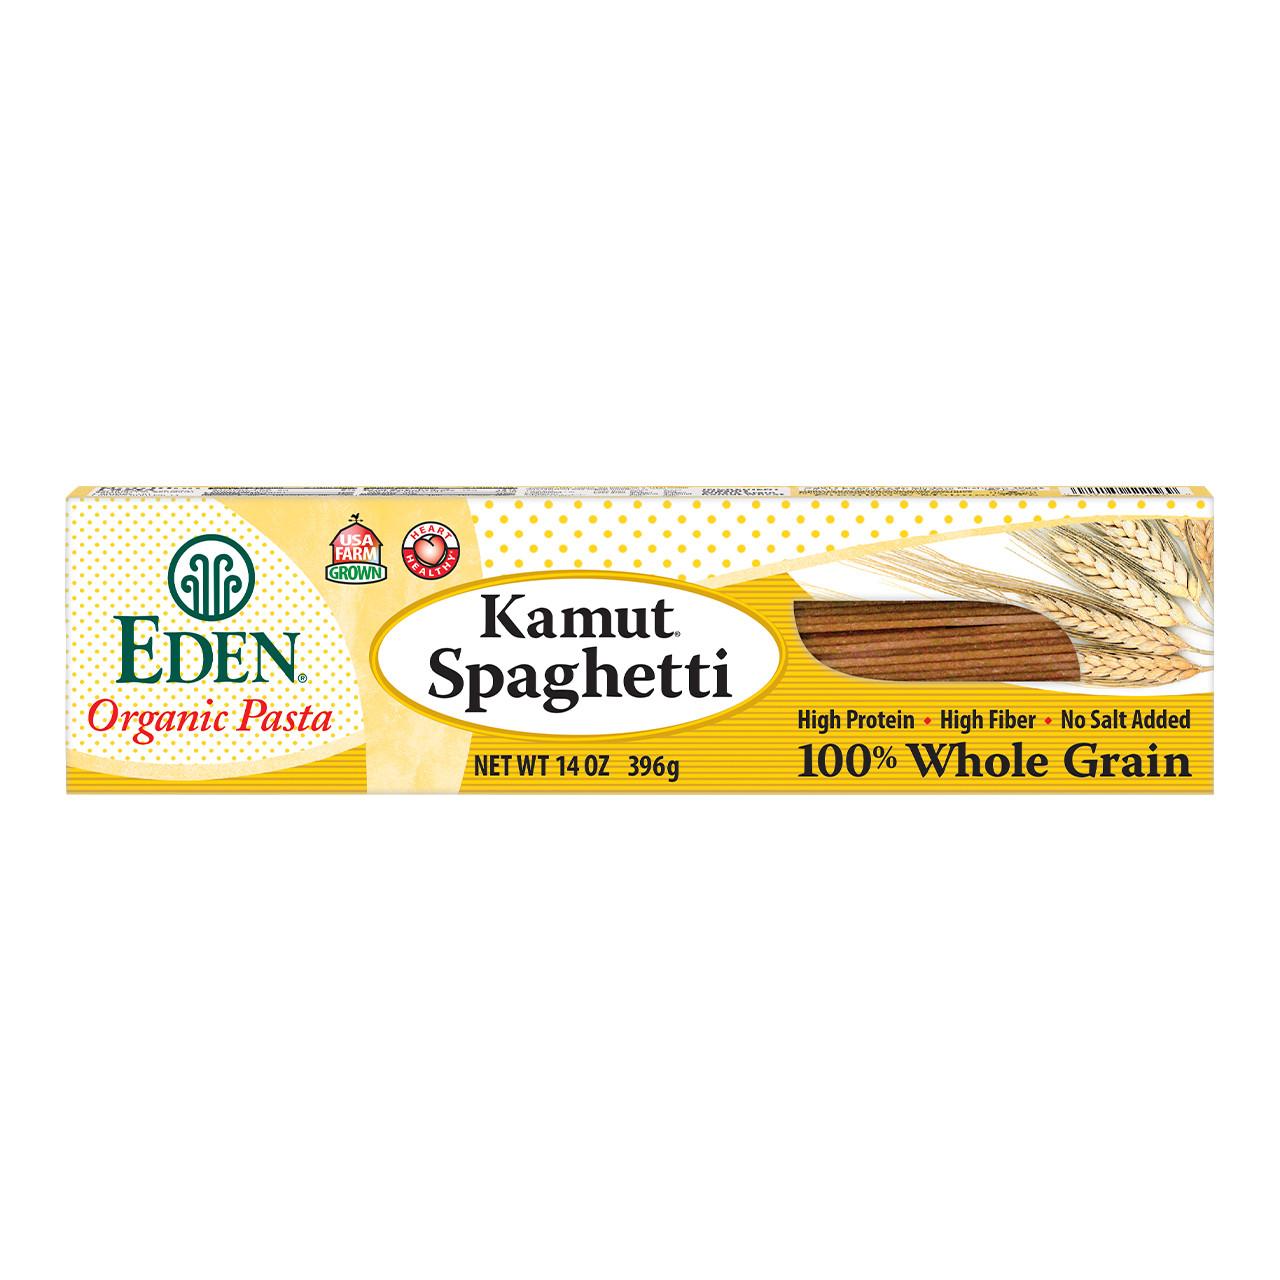 Kamut® Spaghetti, 100% Whole Grain, Organic